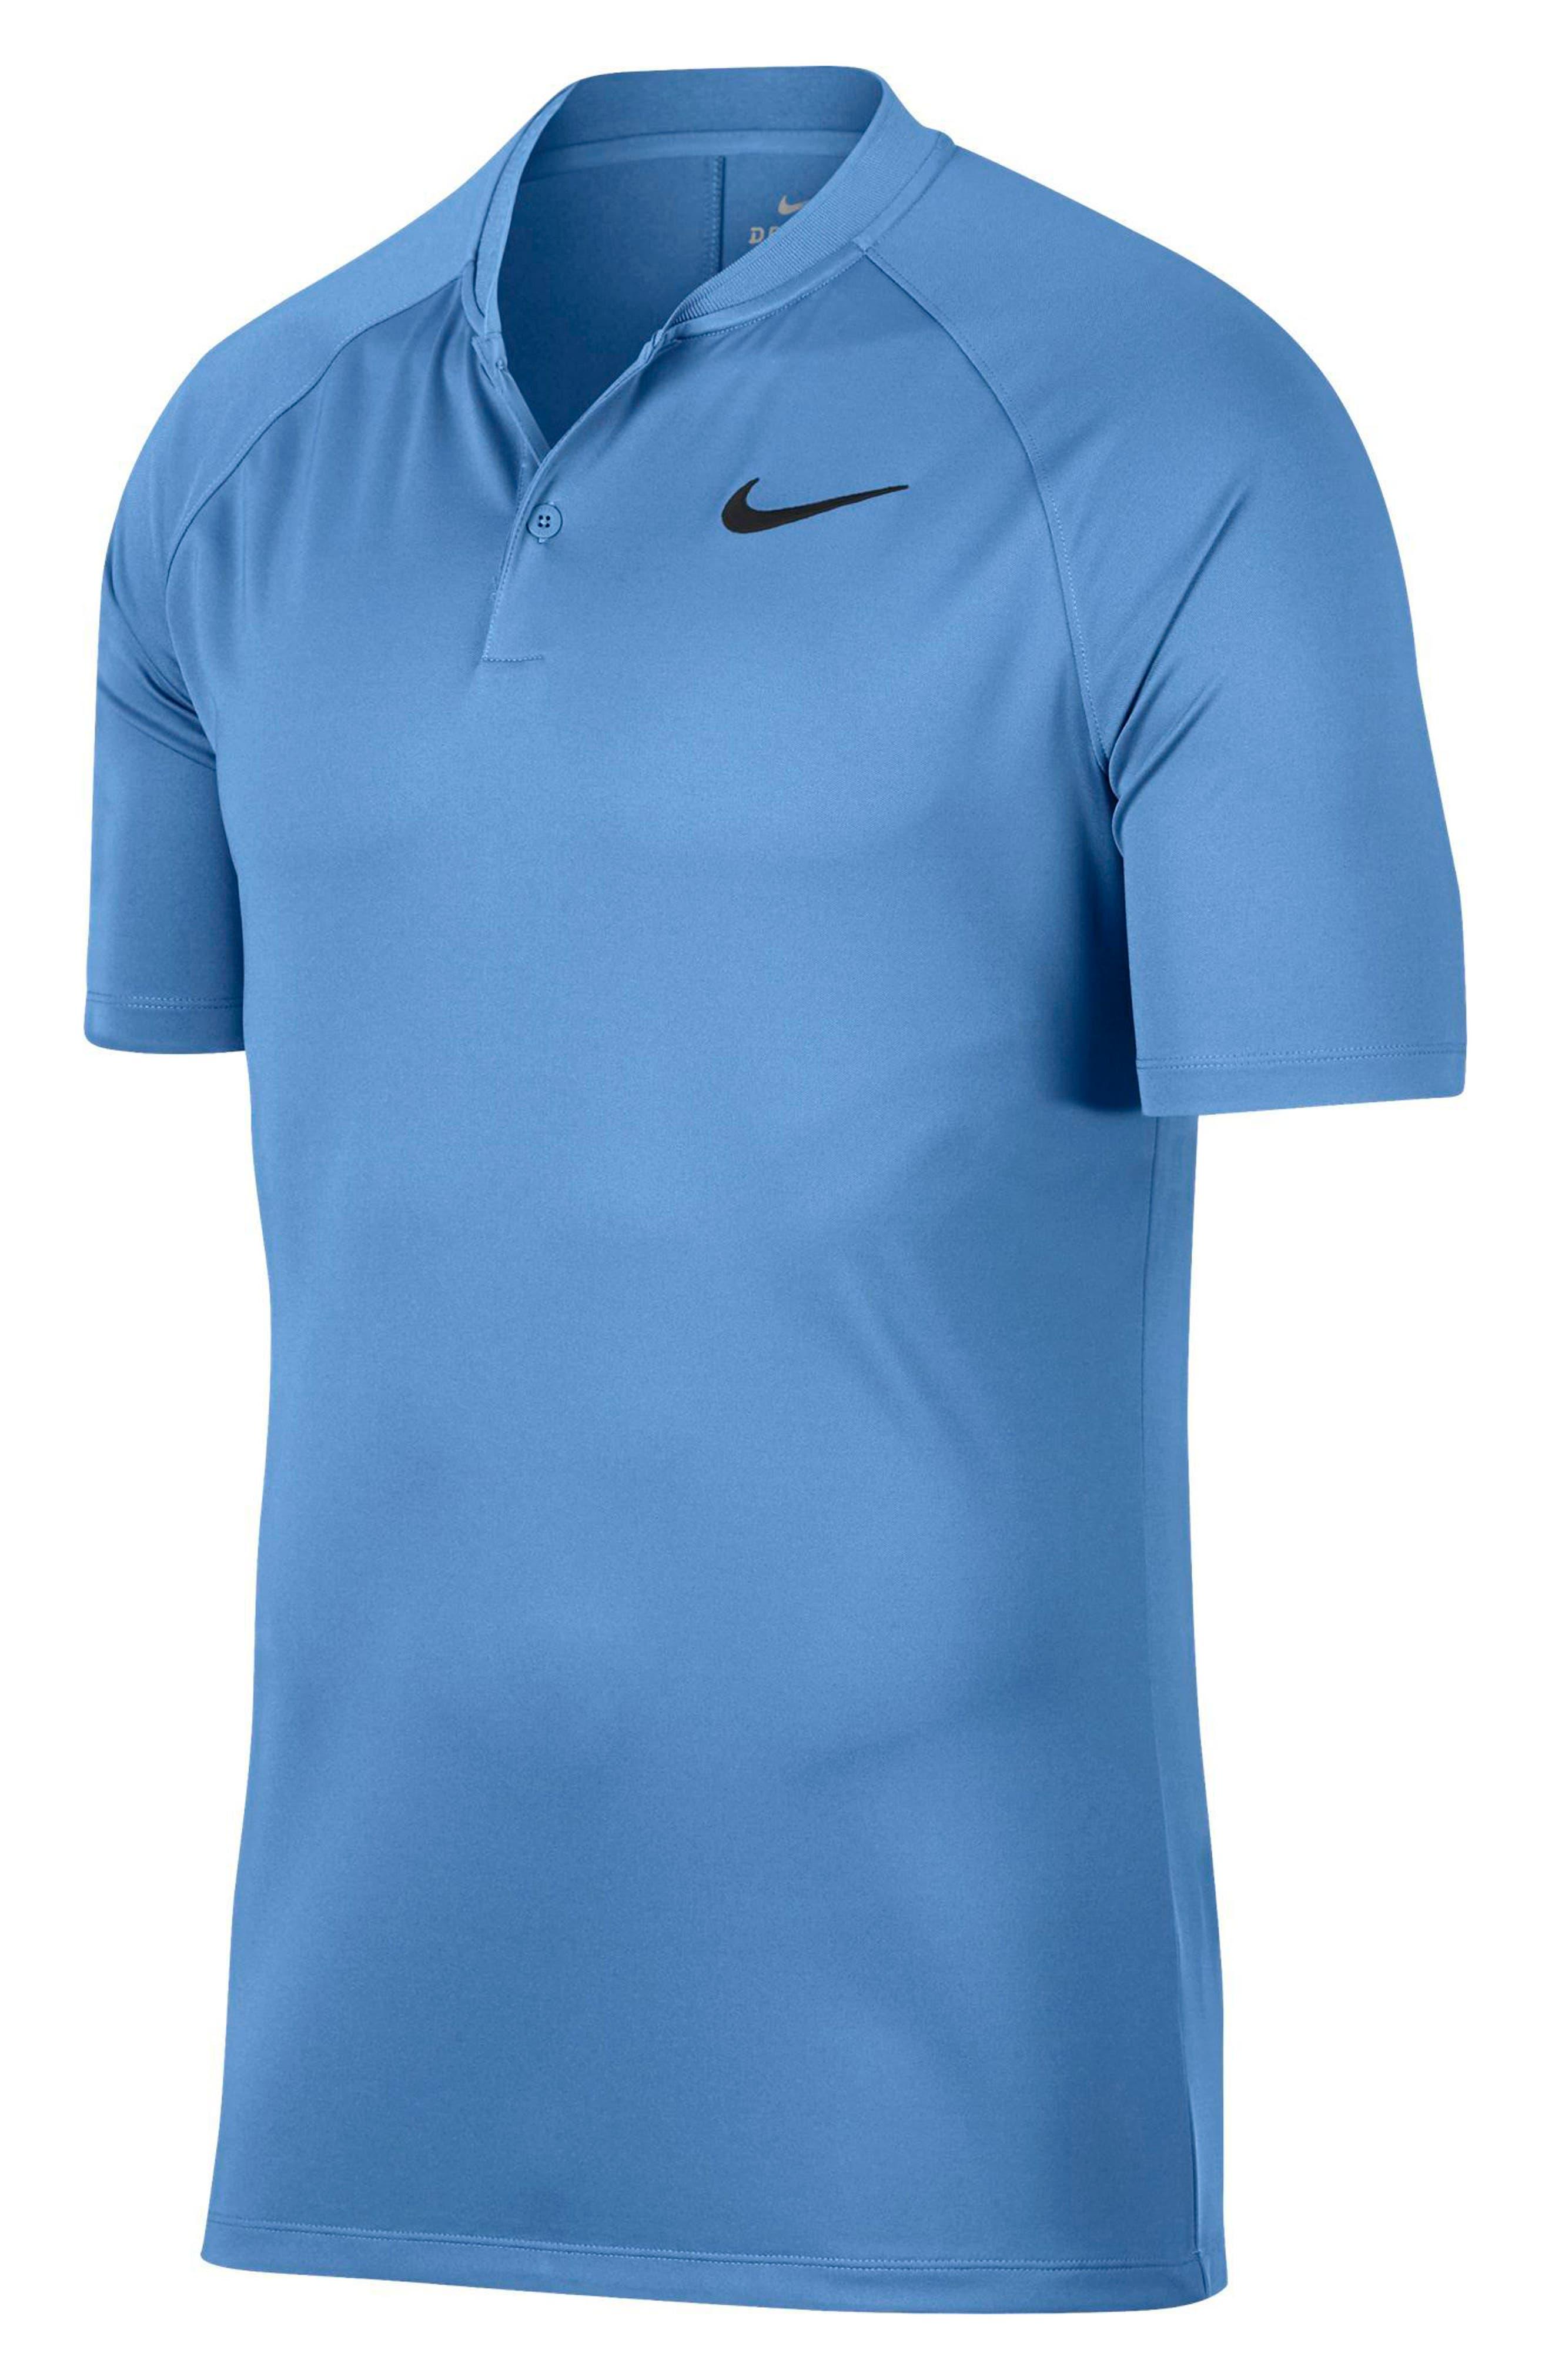 Dry Momentum Golf Polo,                             Main thumbnail 1, color,                             University Blue/ White